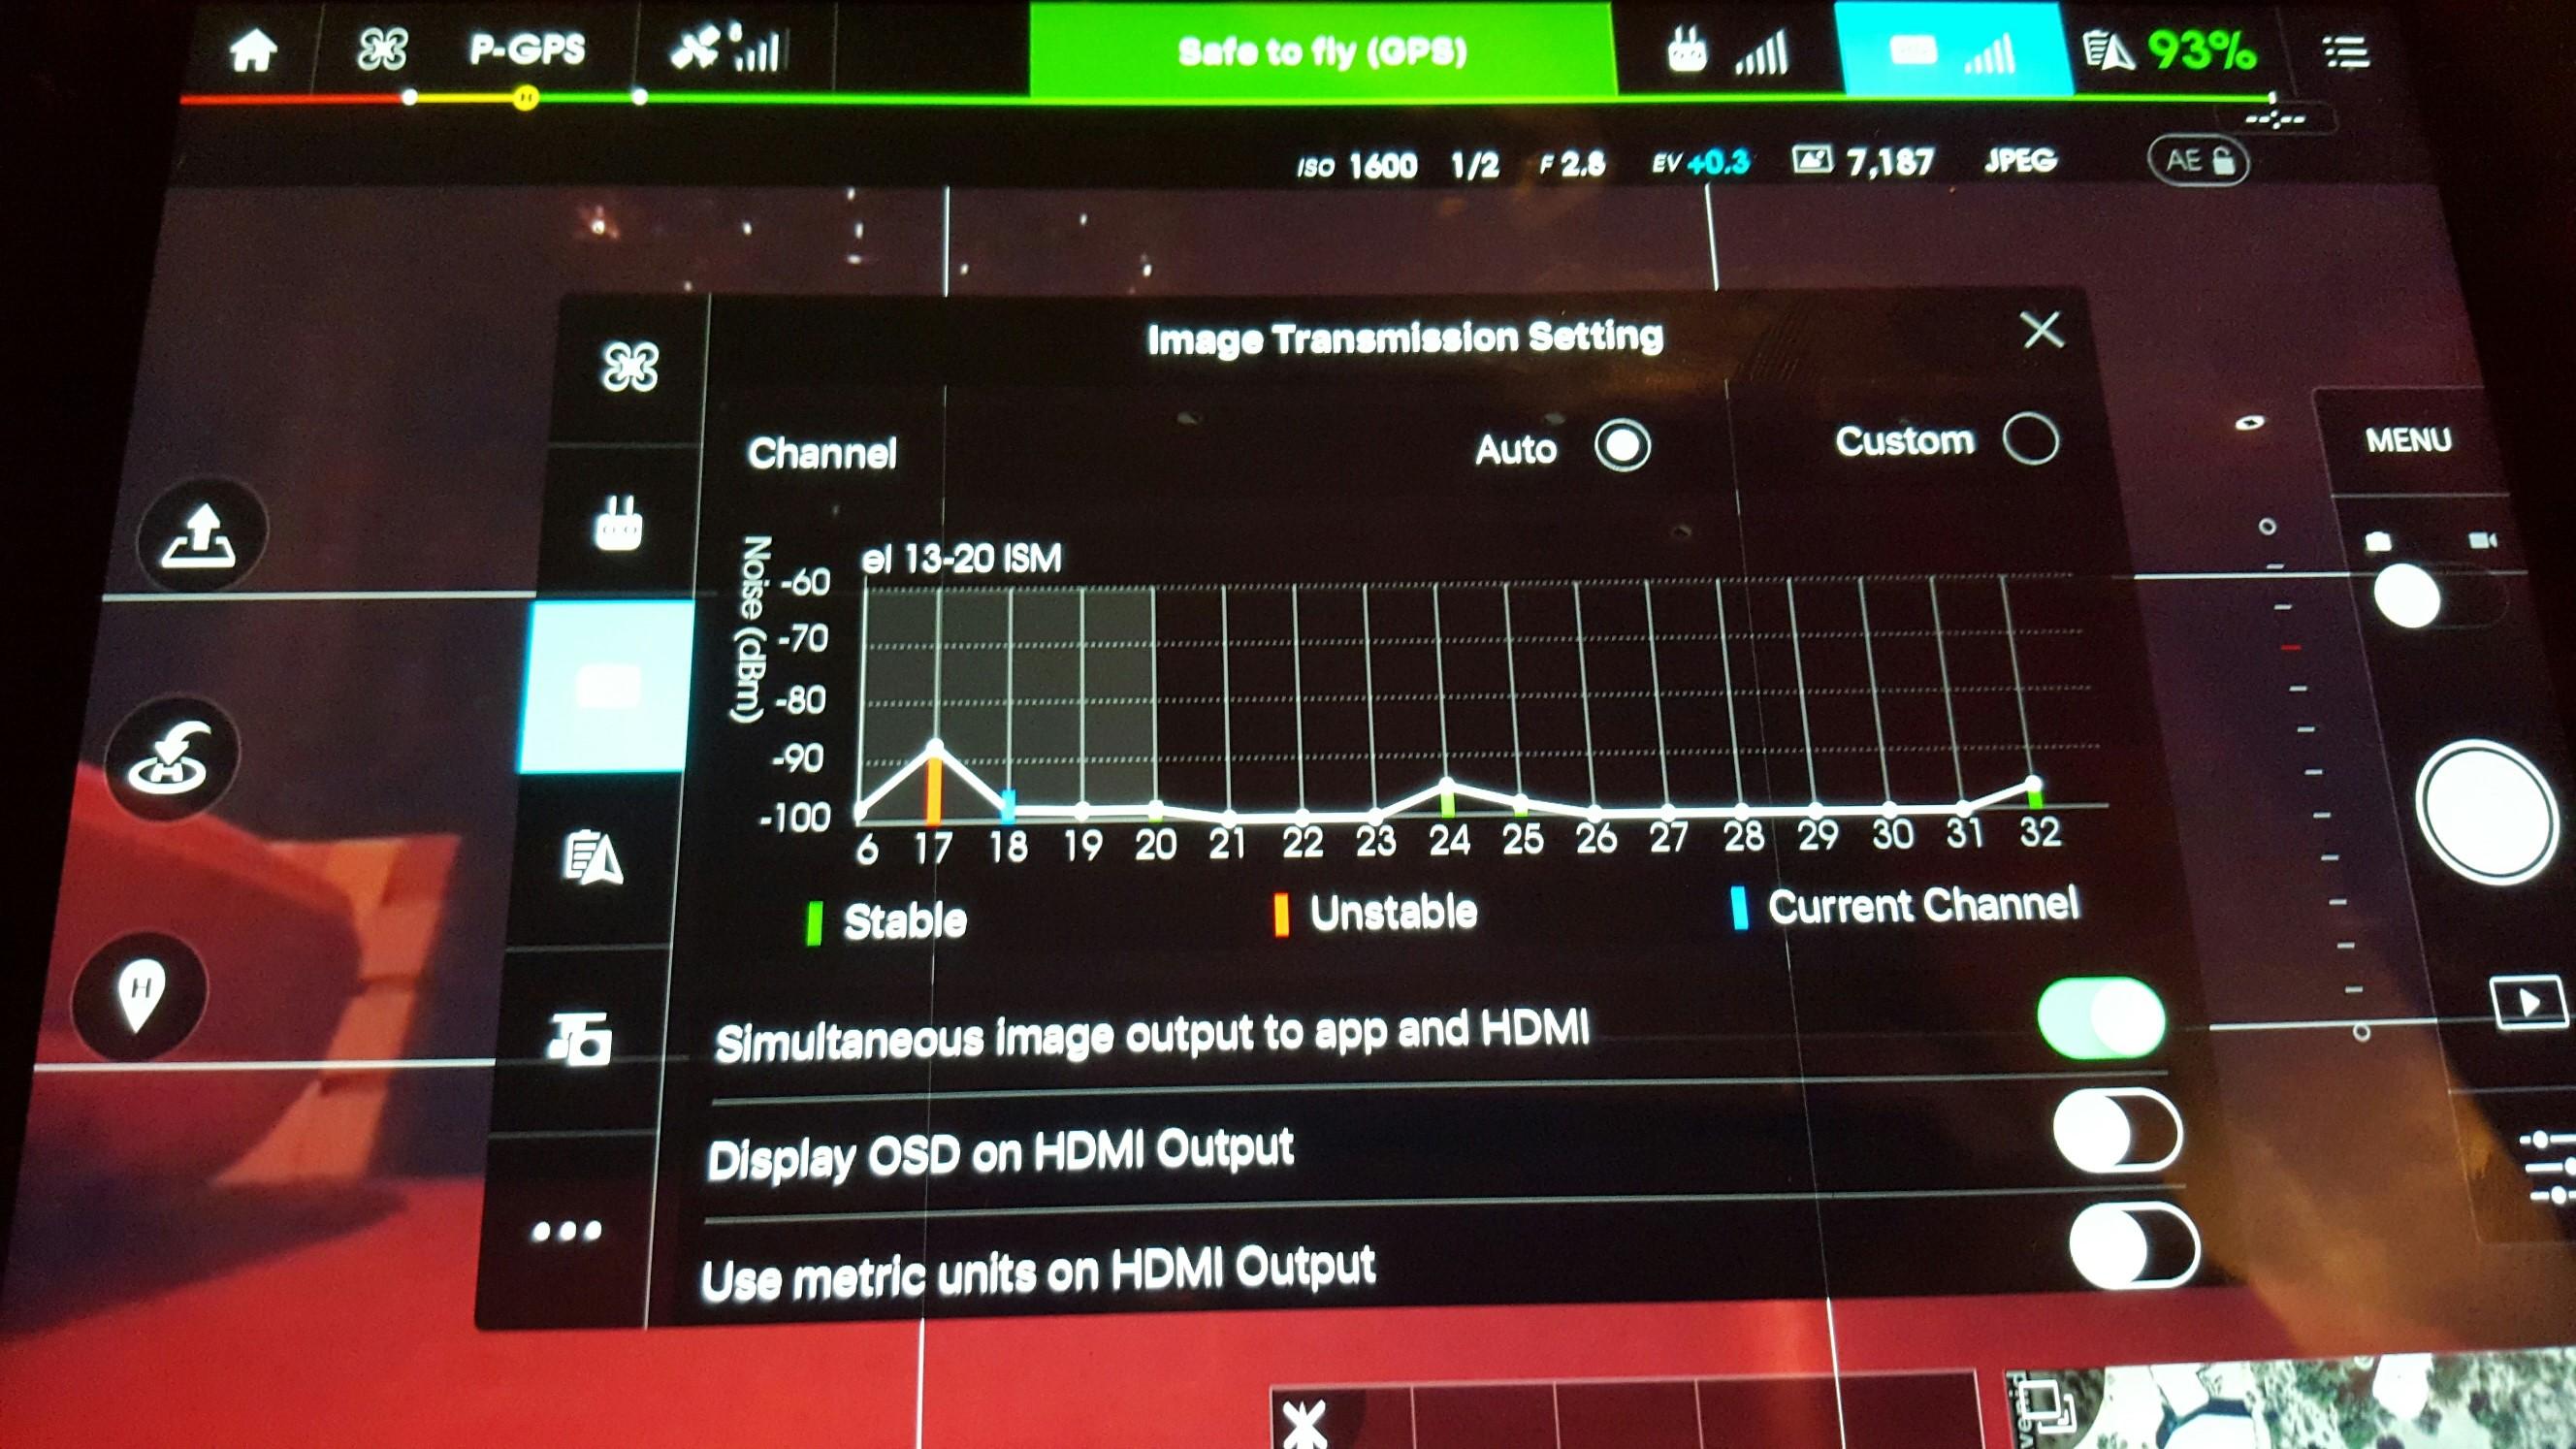 Peachy New Updated Dji Go Version Dji Pilot App Matrice 210 Dji Pilot App Manual New Channel Hack dpreview Dji Pilot App